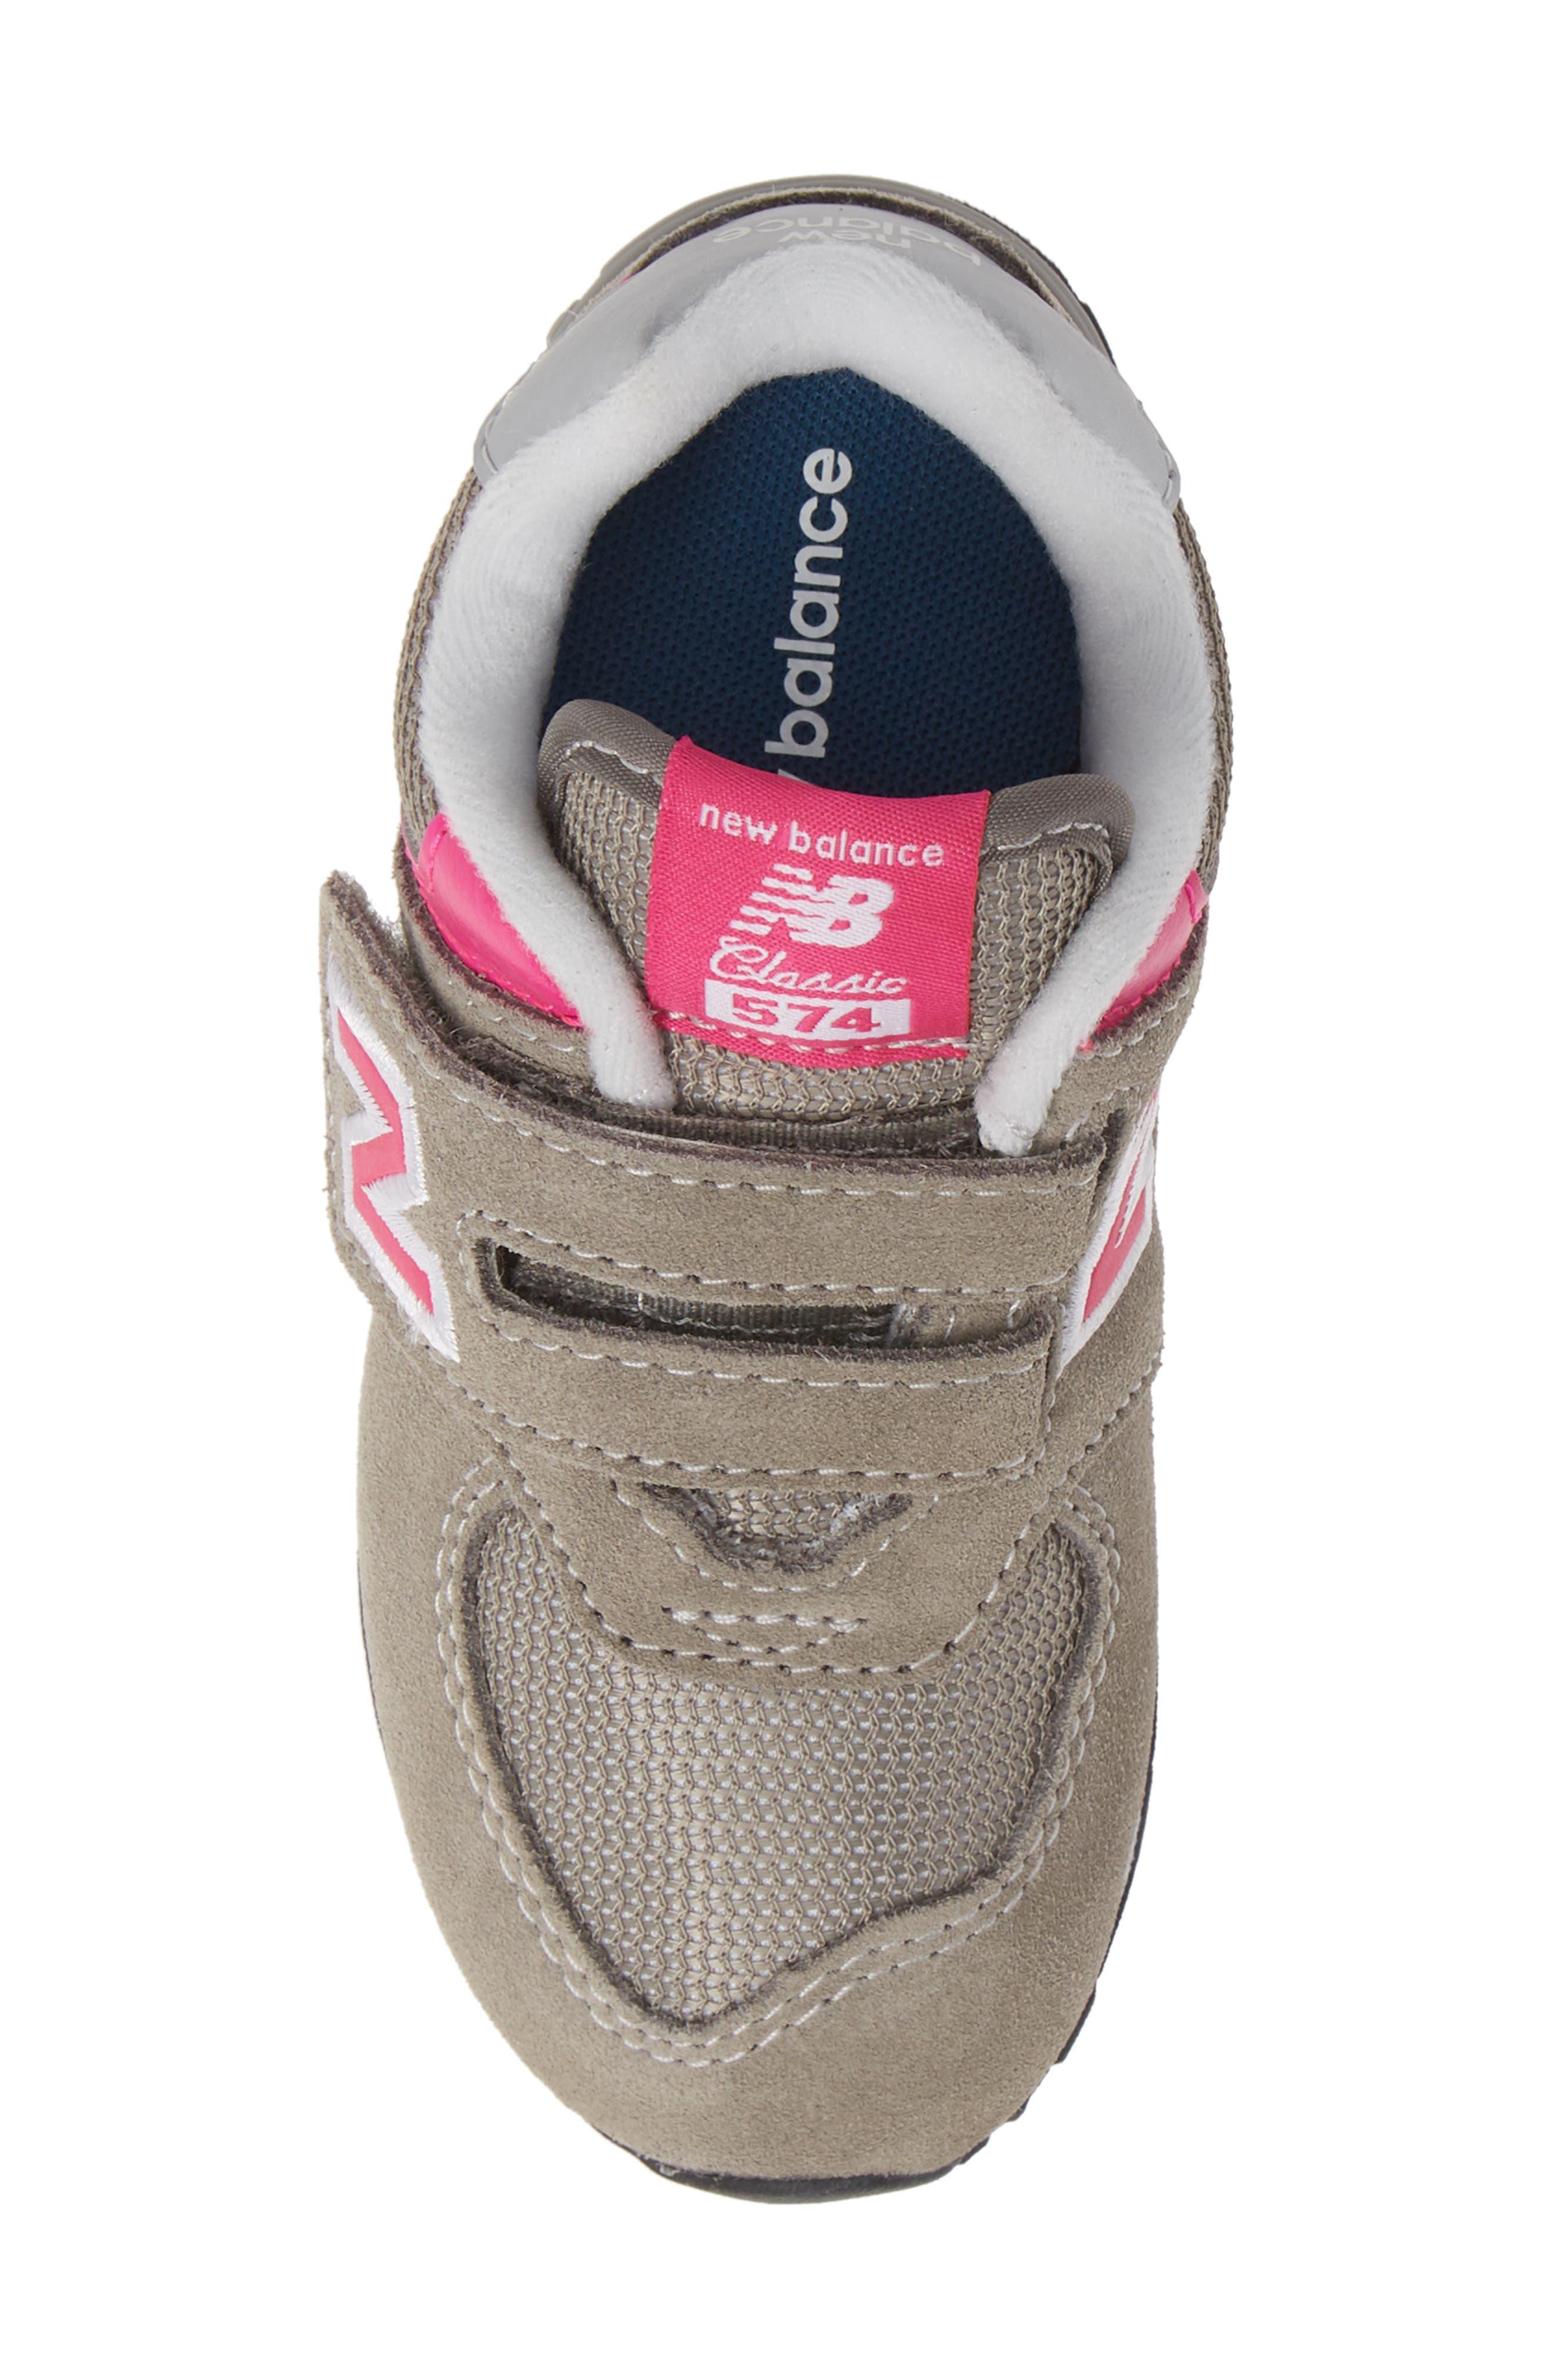 NEW BALANCE, '574 Core' Sneaker, Alternate thumbnail 5, color, GREY/ PINK